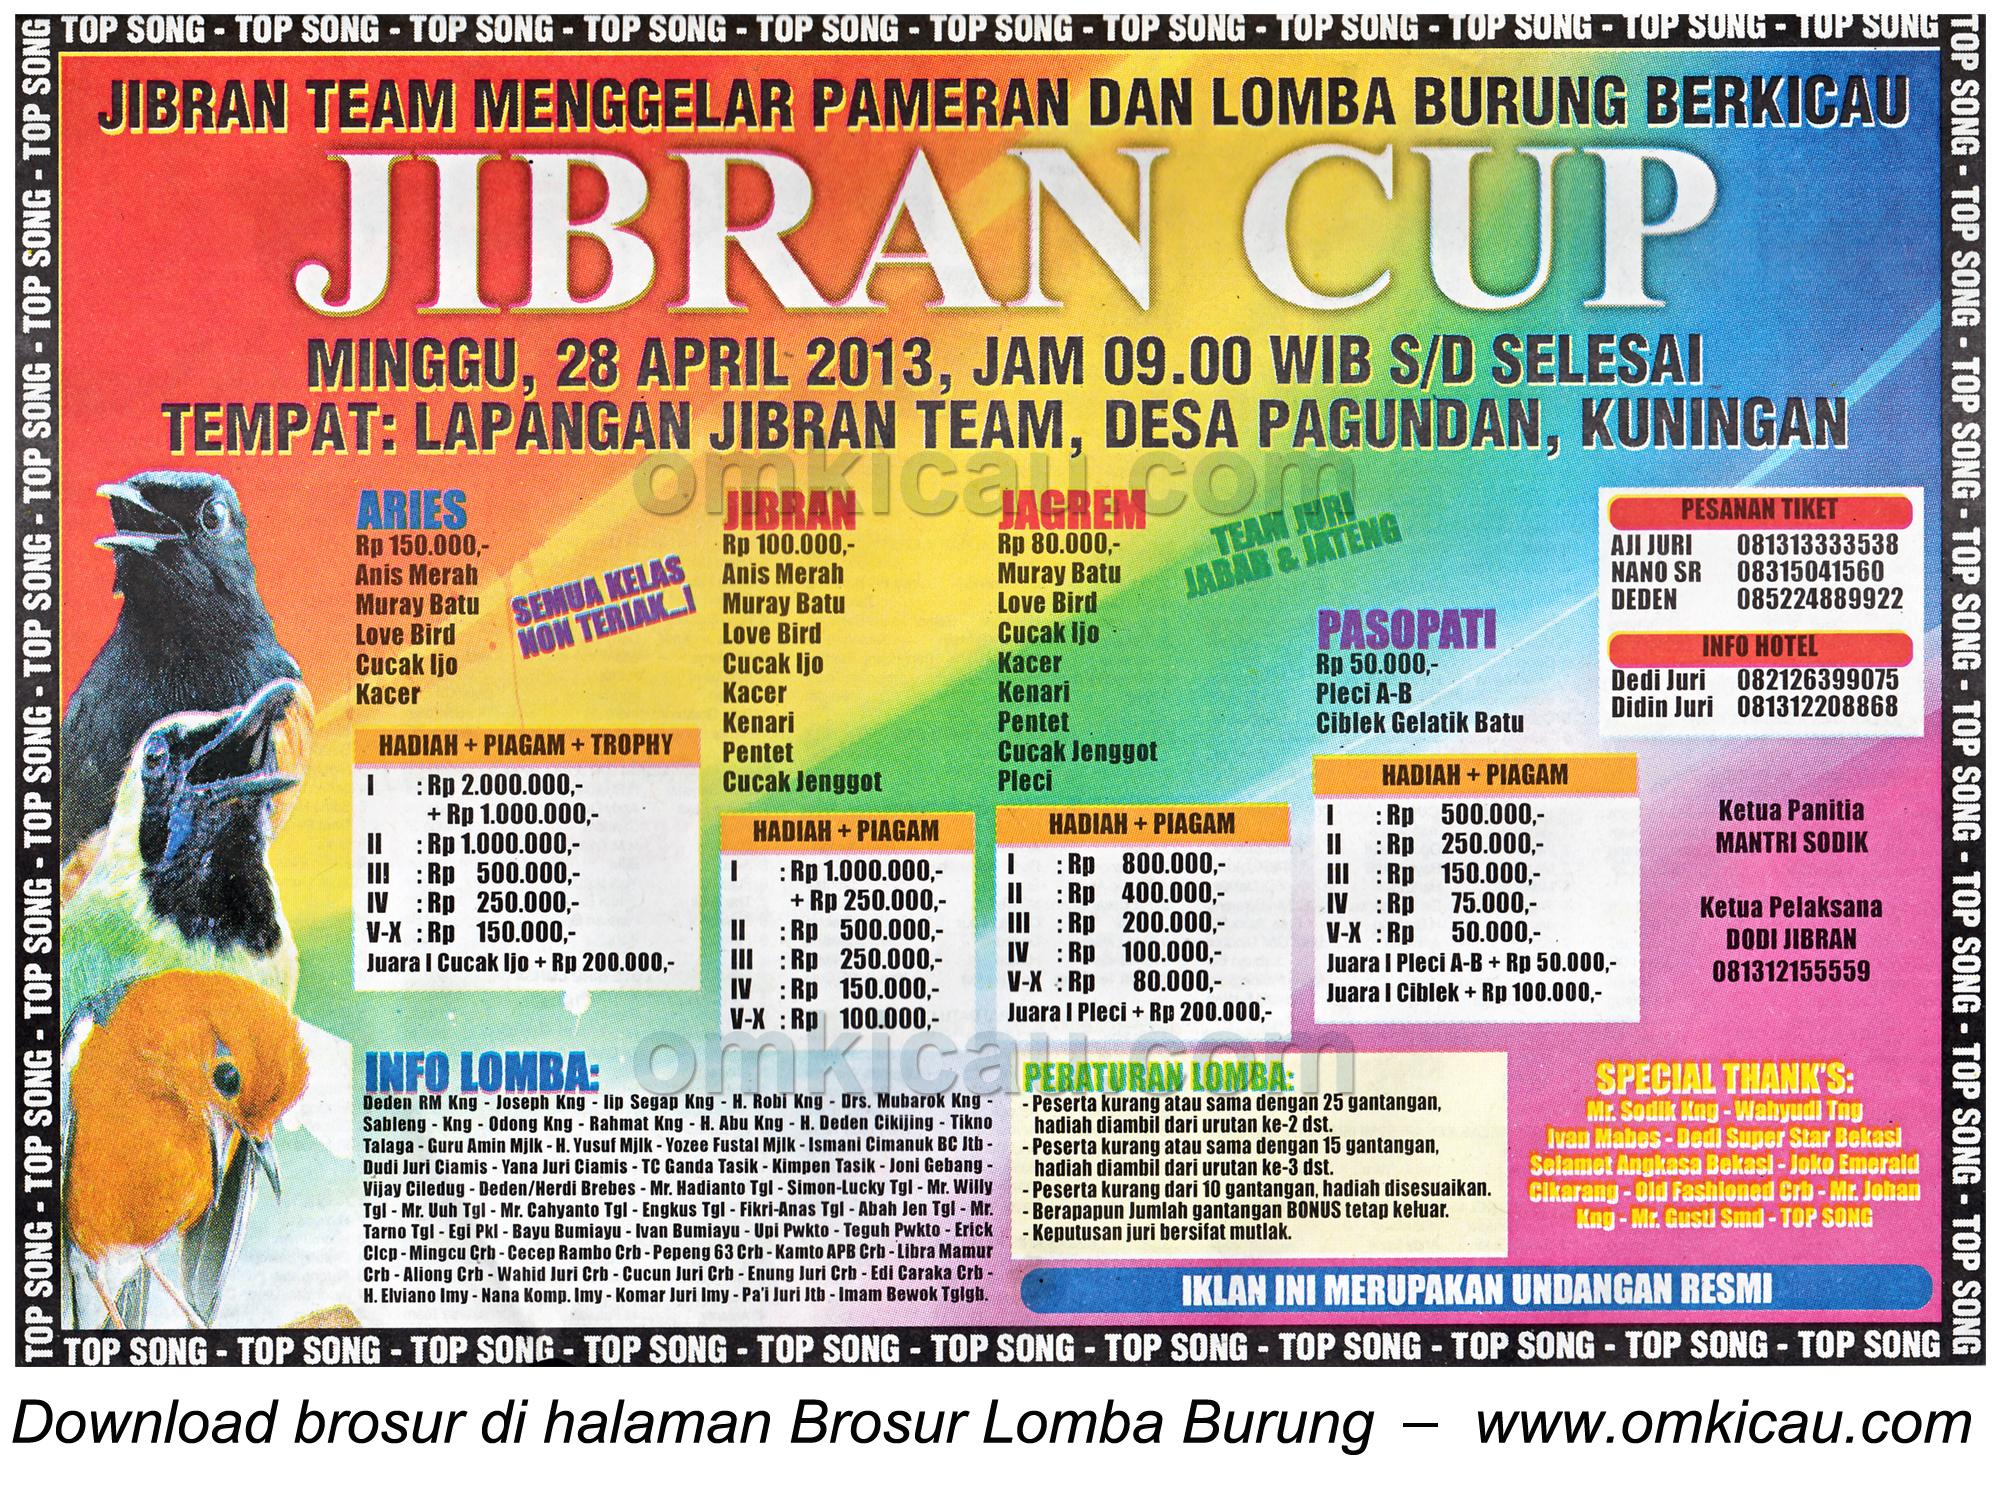 Brosur Lomba Burung Jibran Cup - Kuningan - 28 April 2013